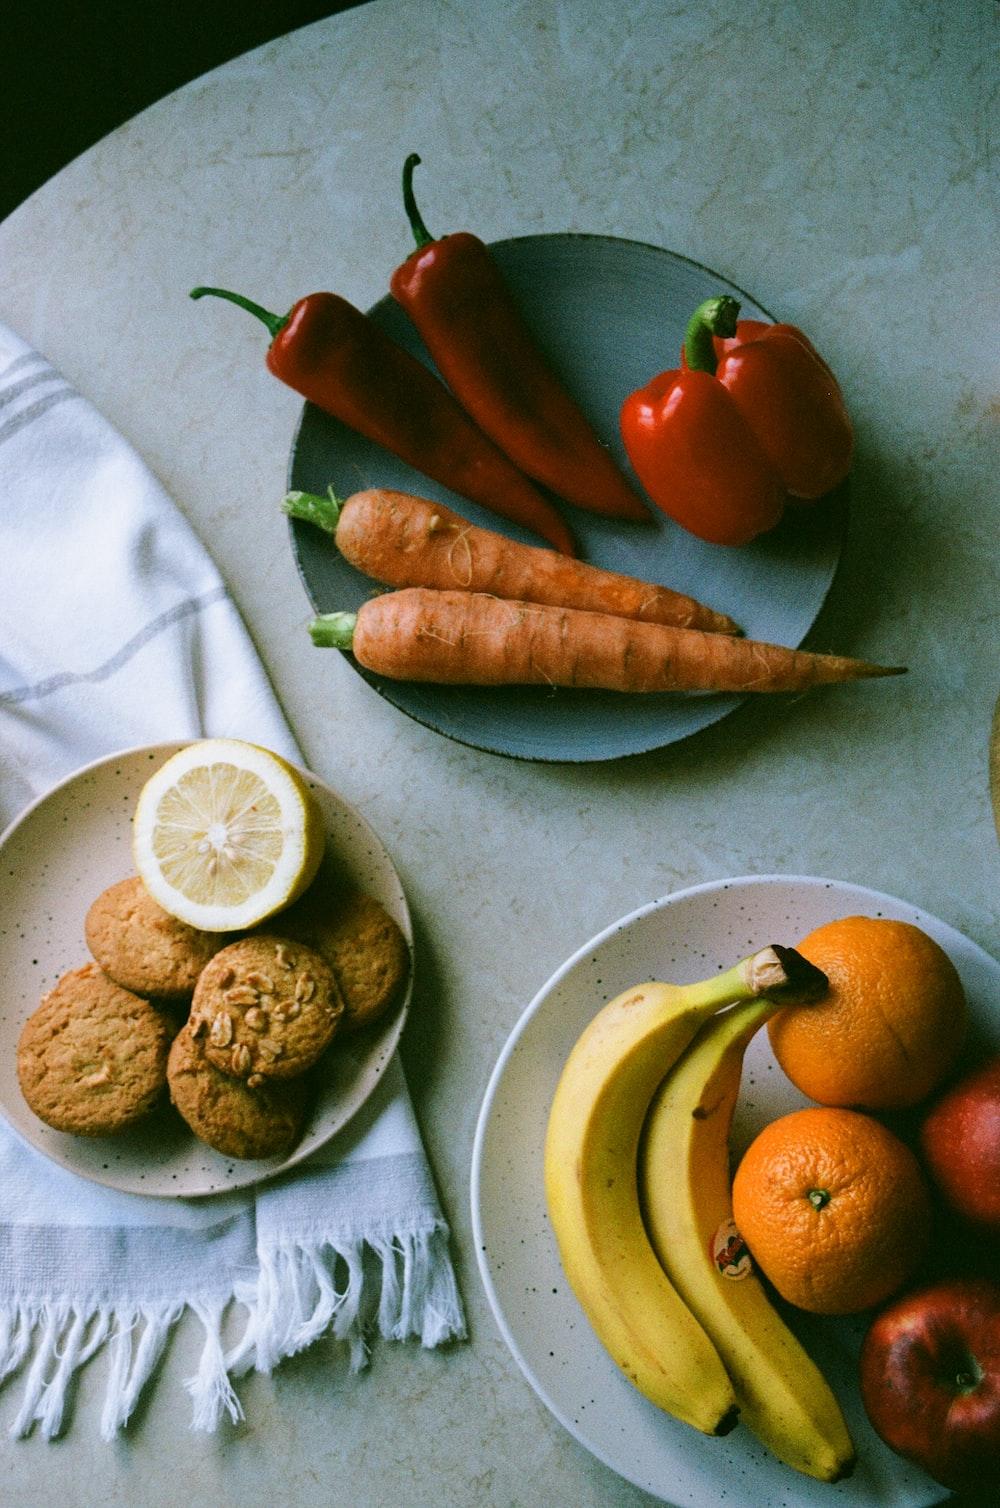 orange and banana fruits on white ceramic plate